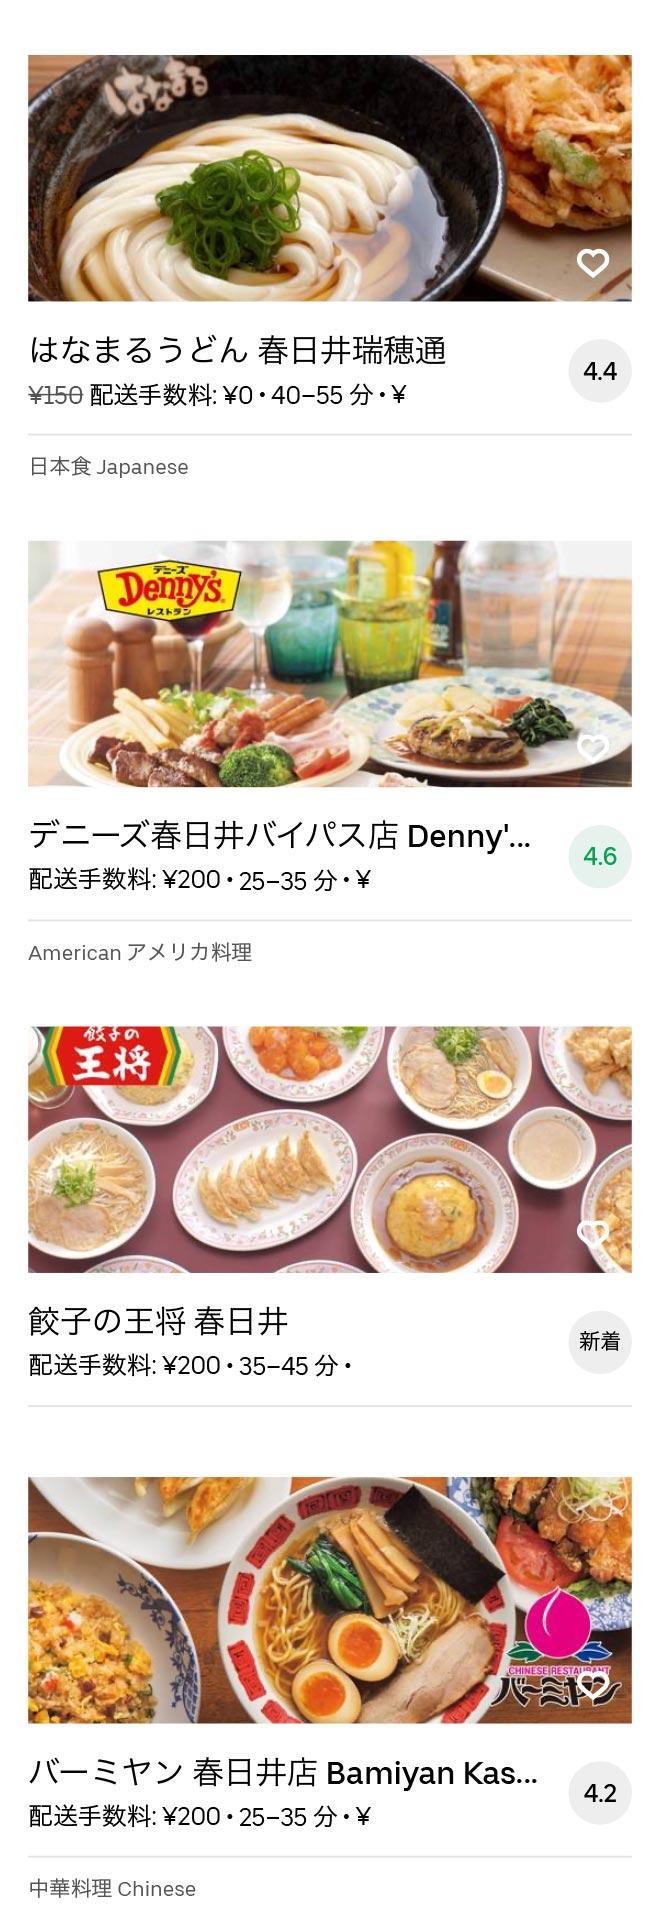 Kachigawa menu 2010 04